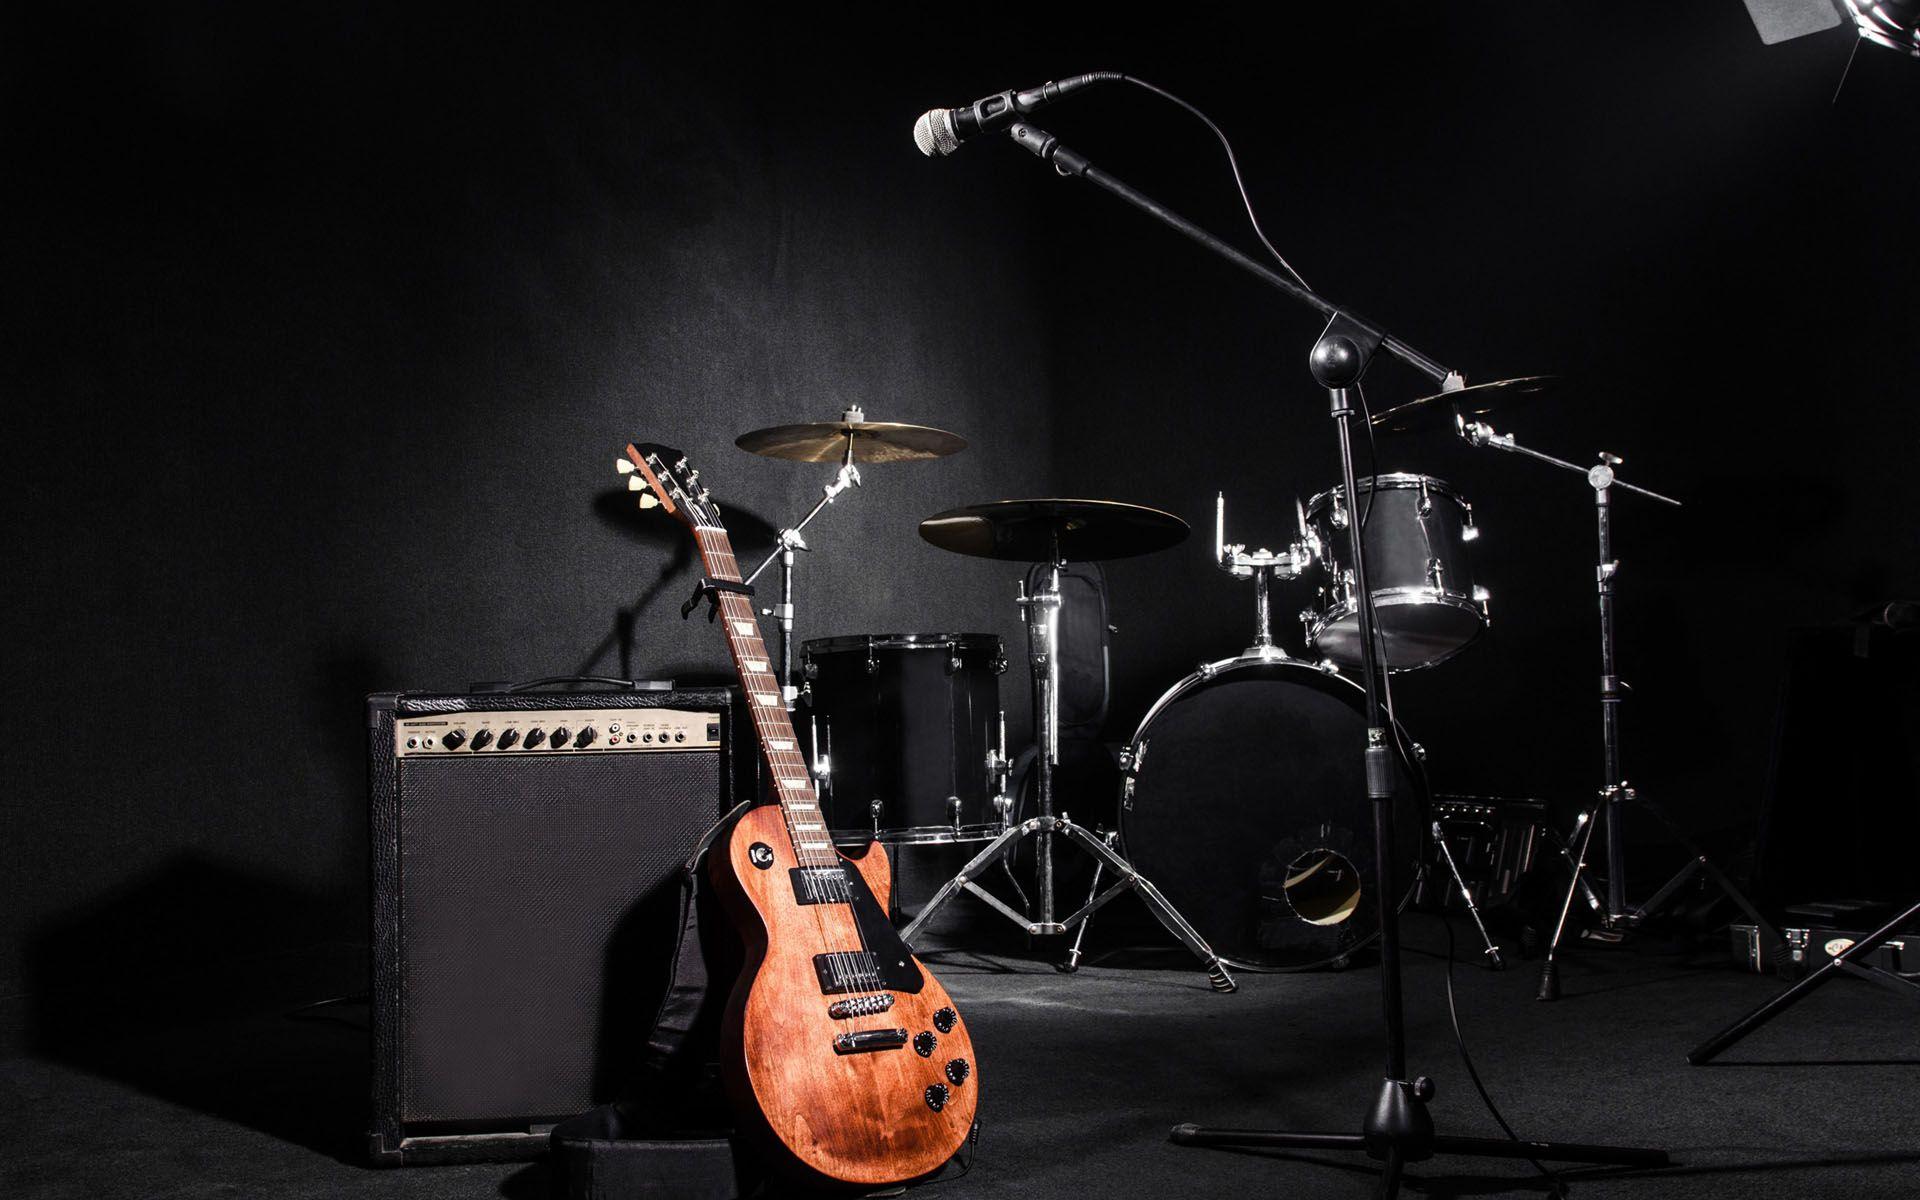 Guitar Wallpapers Hd Resolution